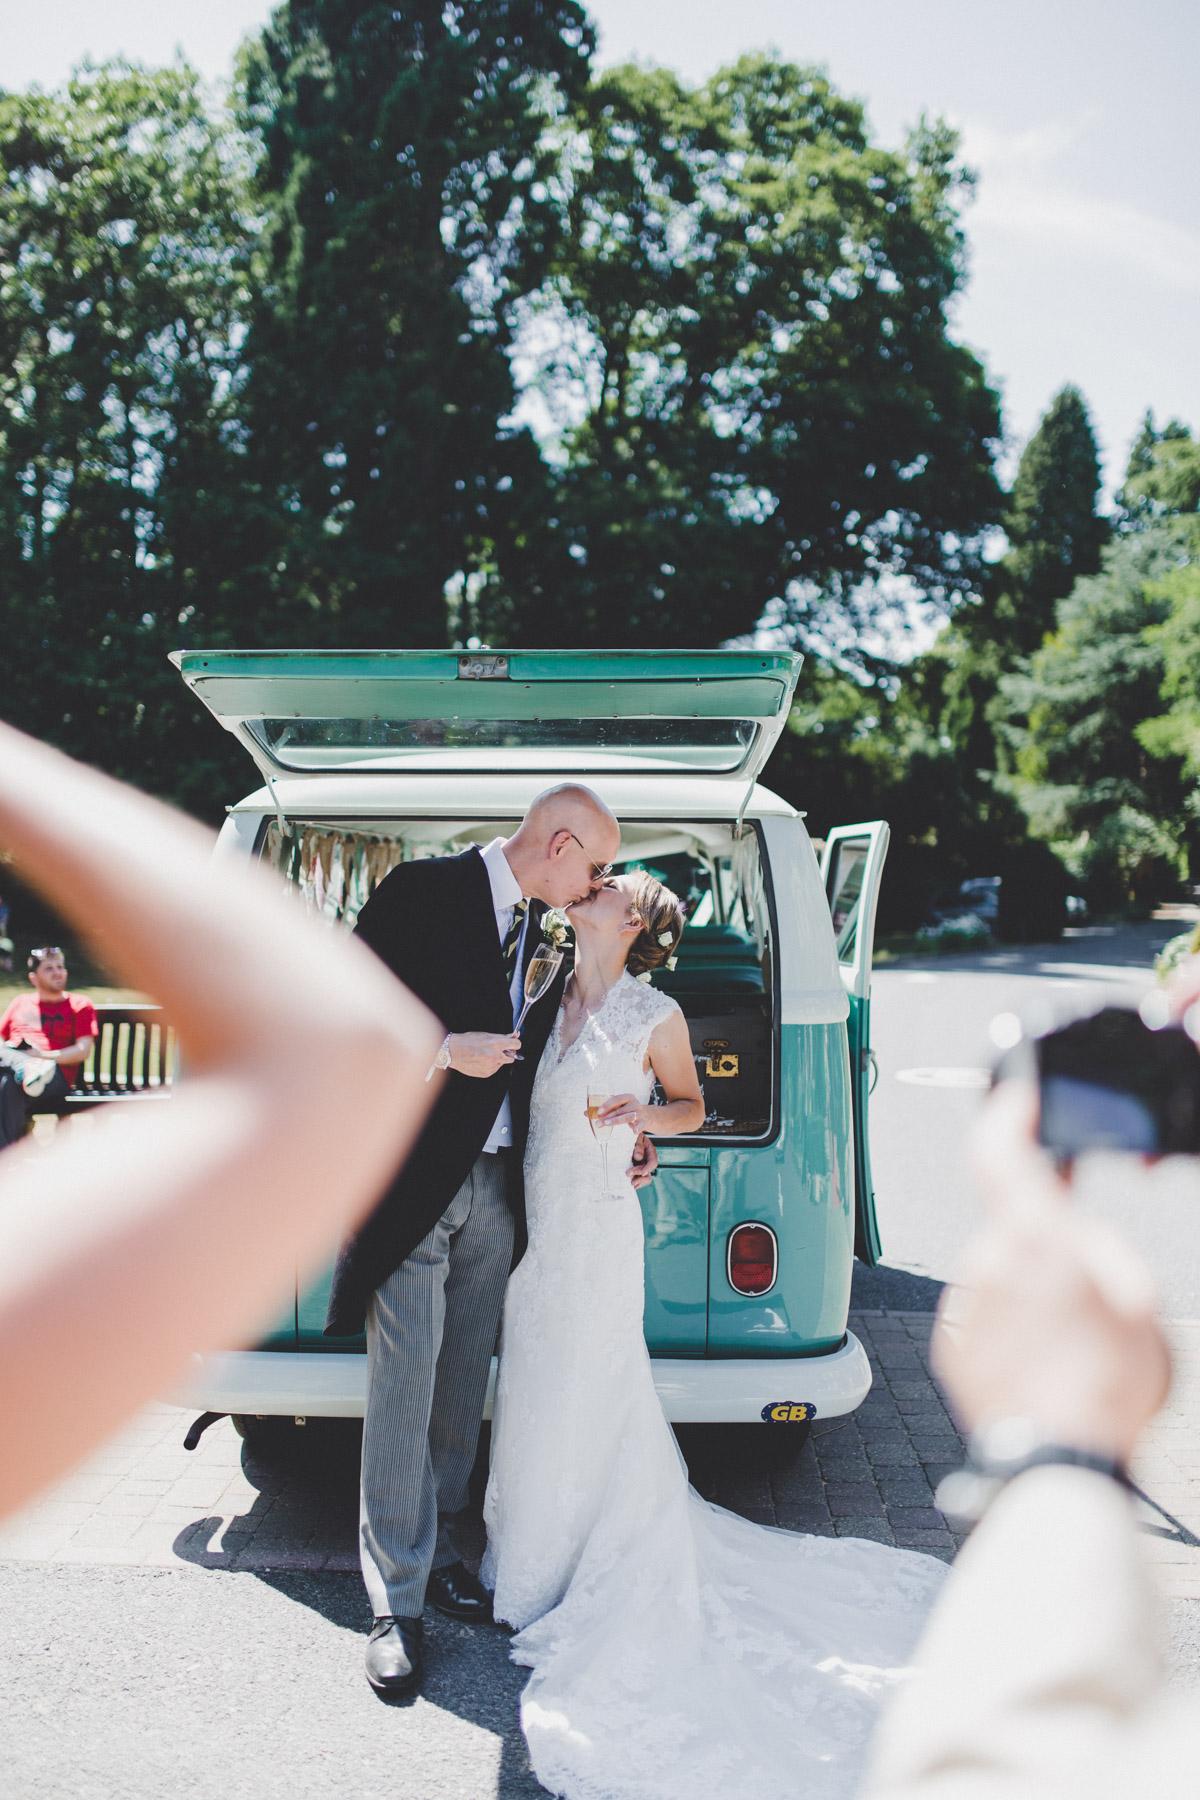 kate-gray-wedding-photography-75.jpg